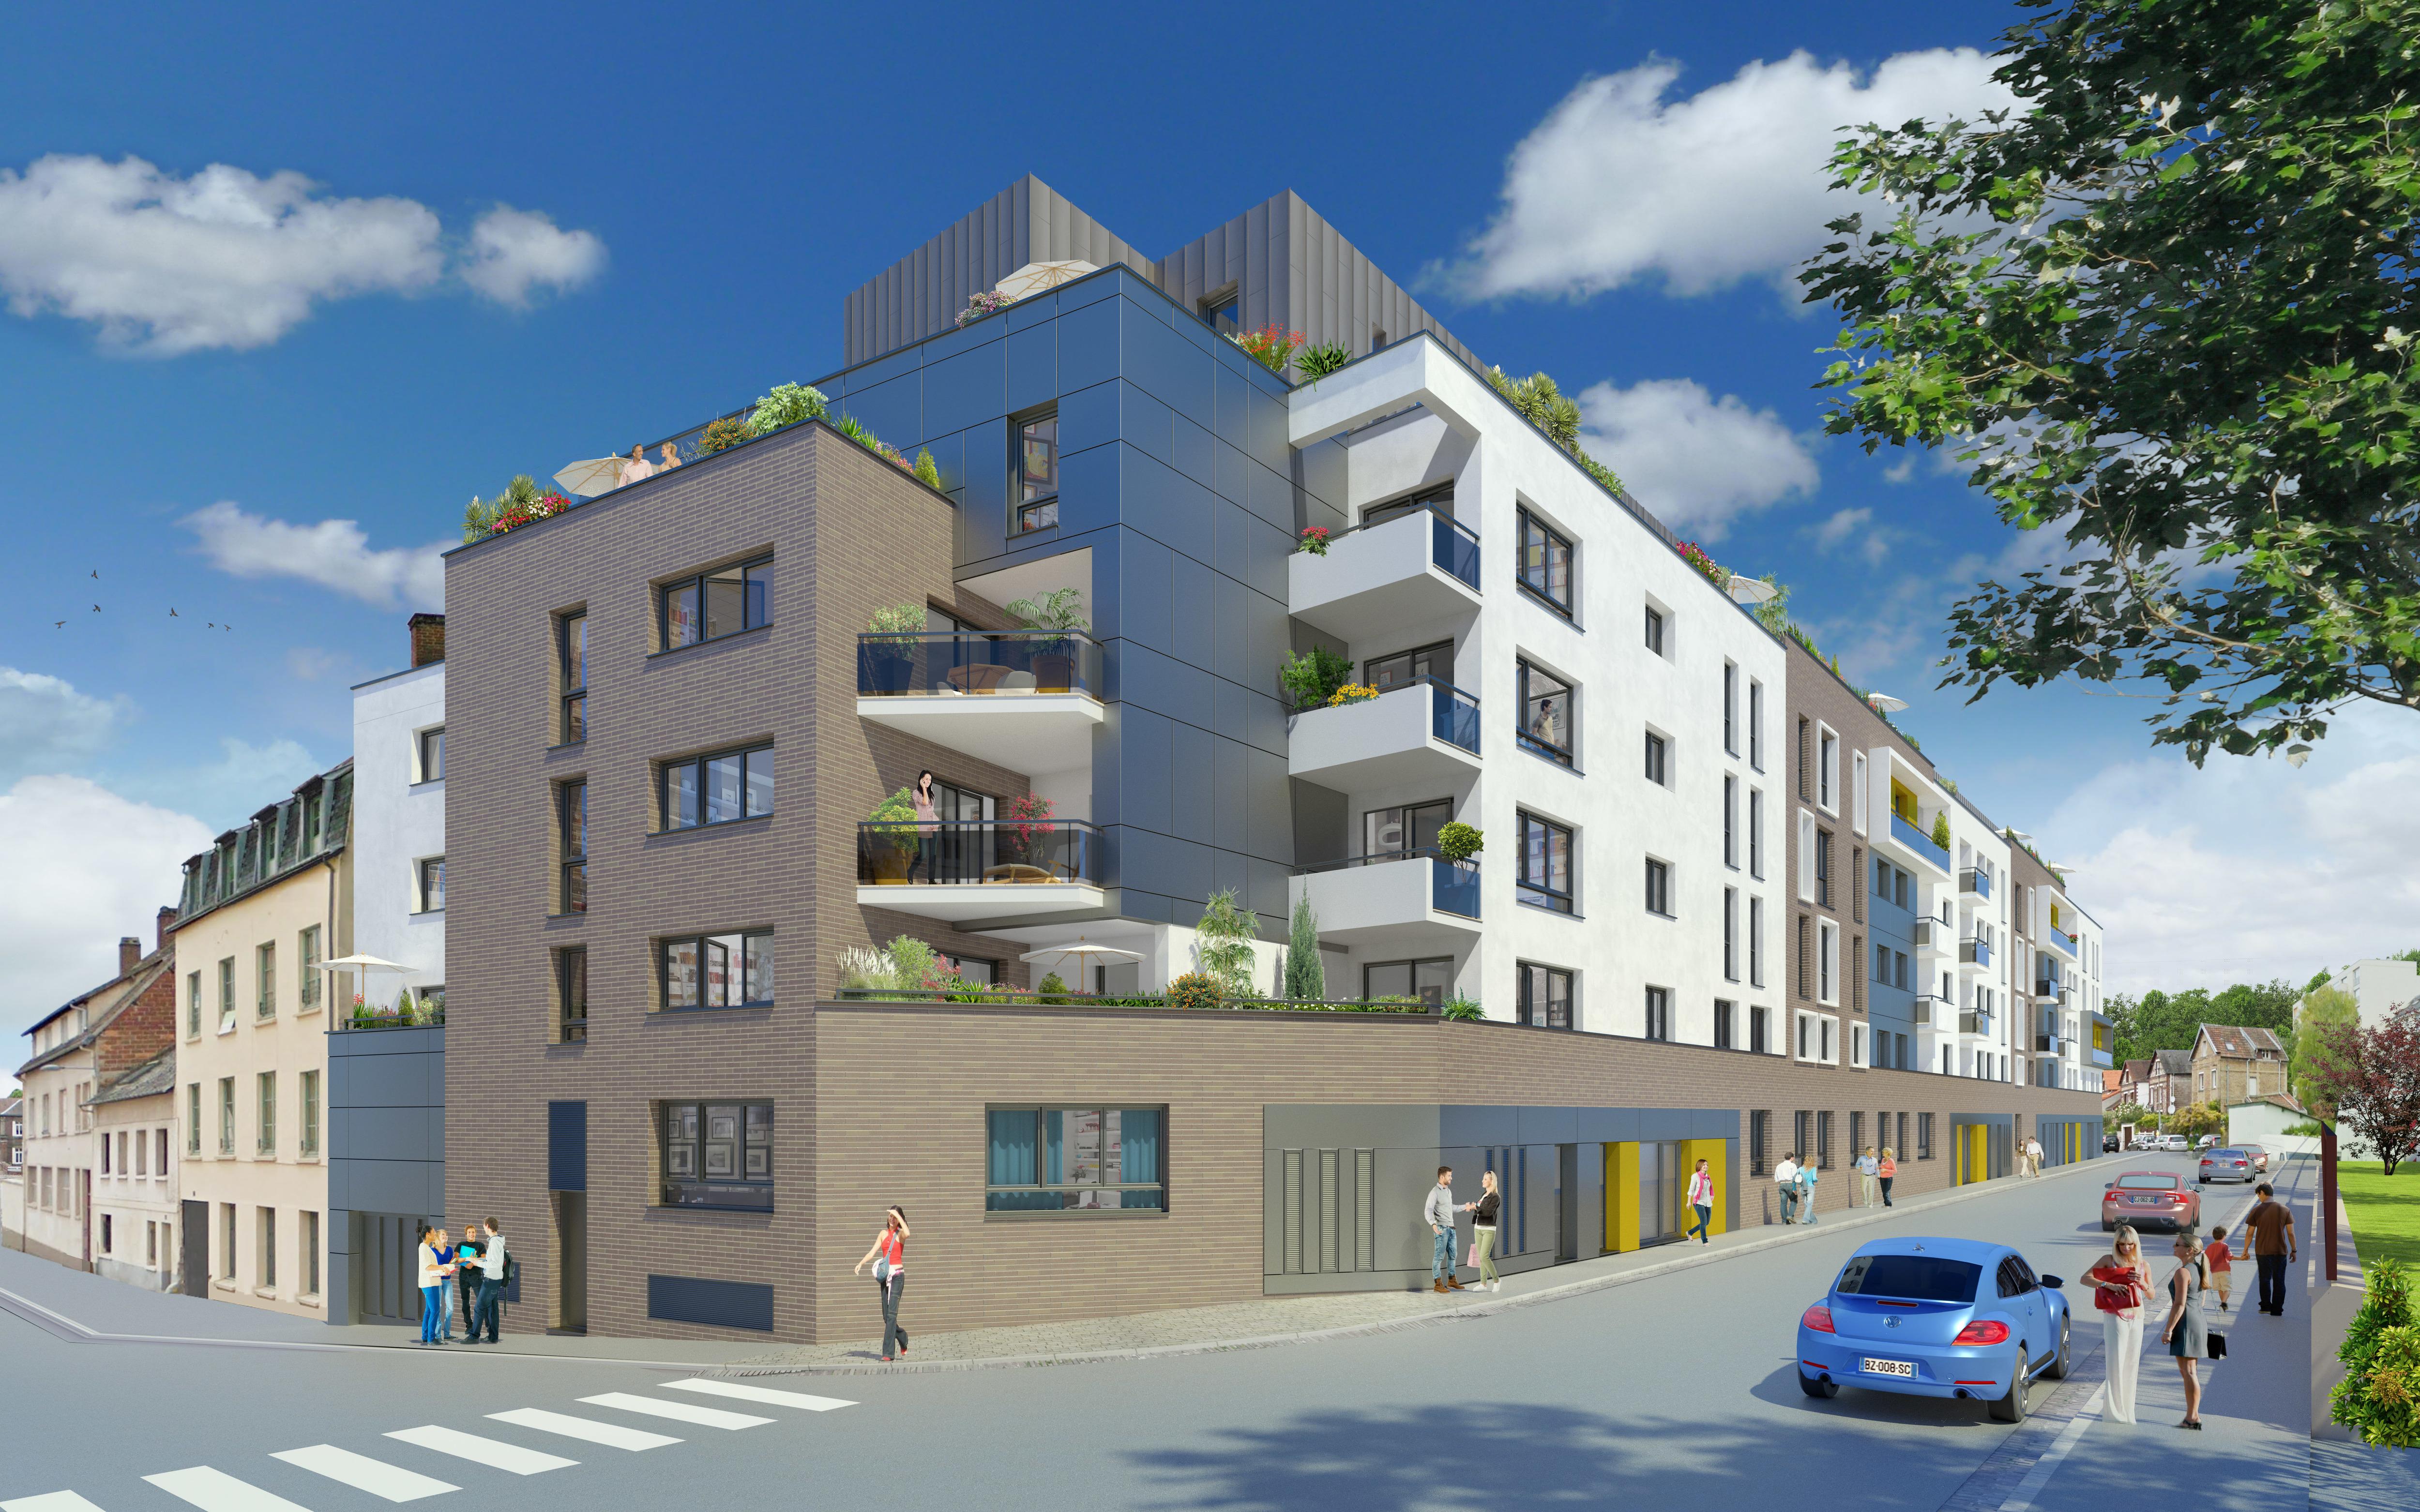 Programme immobilier plein 39 r rouen 142 000 275 000 for Programme immobilier rouen